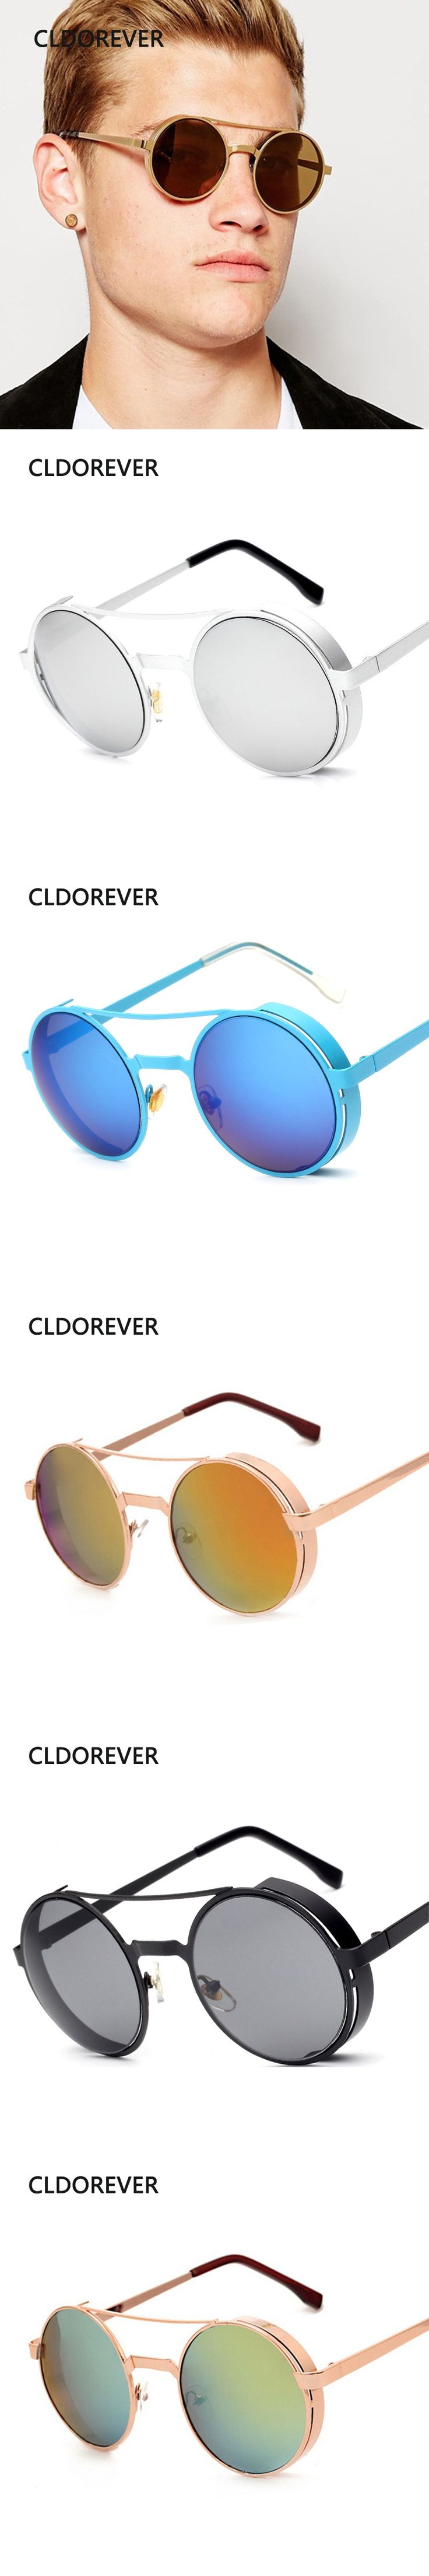 New 2017 Vintage Steampunk Sunglasses Metal Colorful Round Sunglasses Brand Designer Sun Glasses For Women Men Lentes De Sol